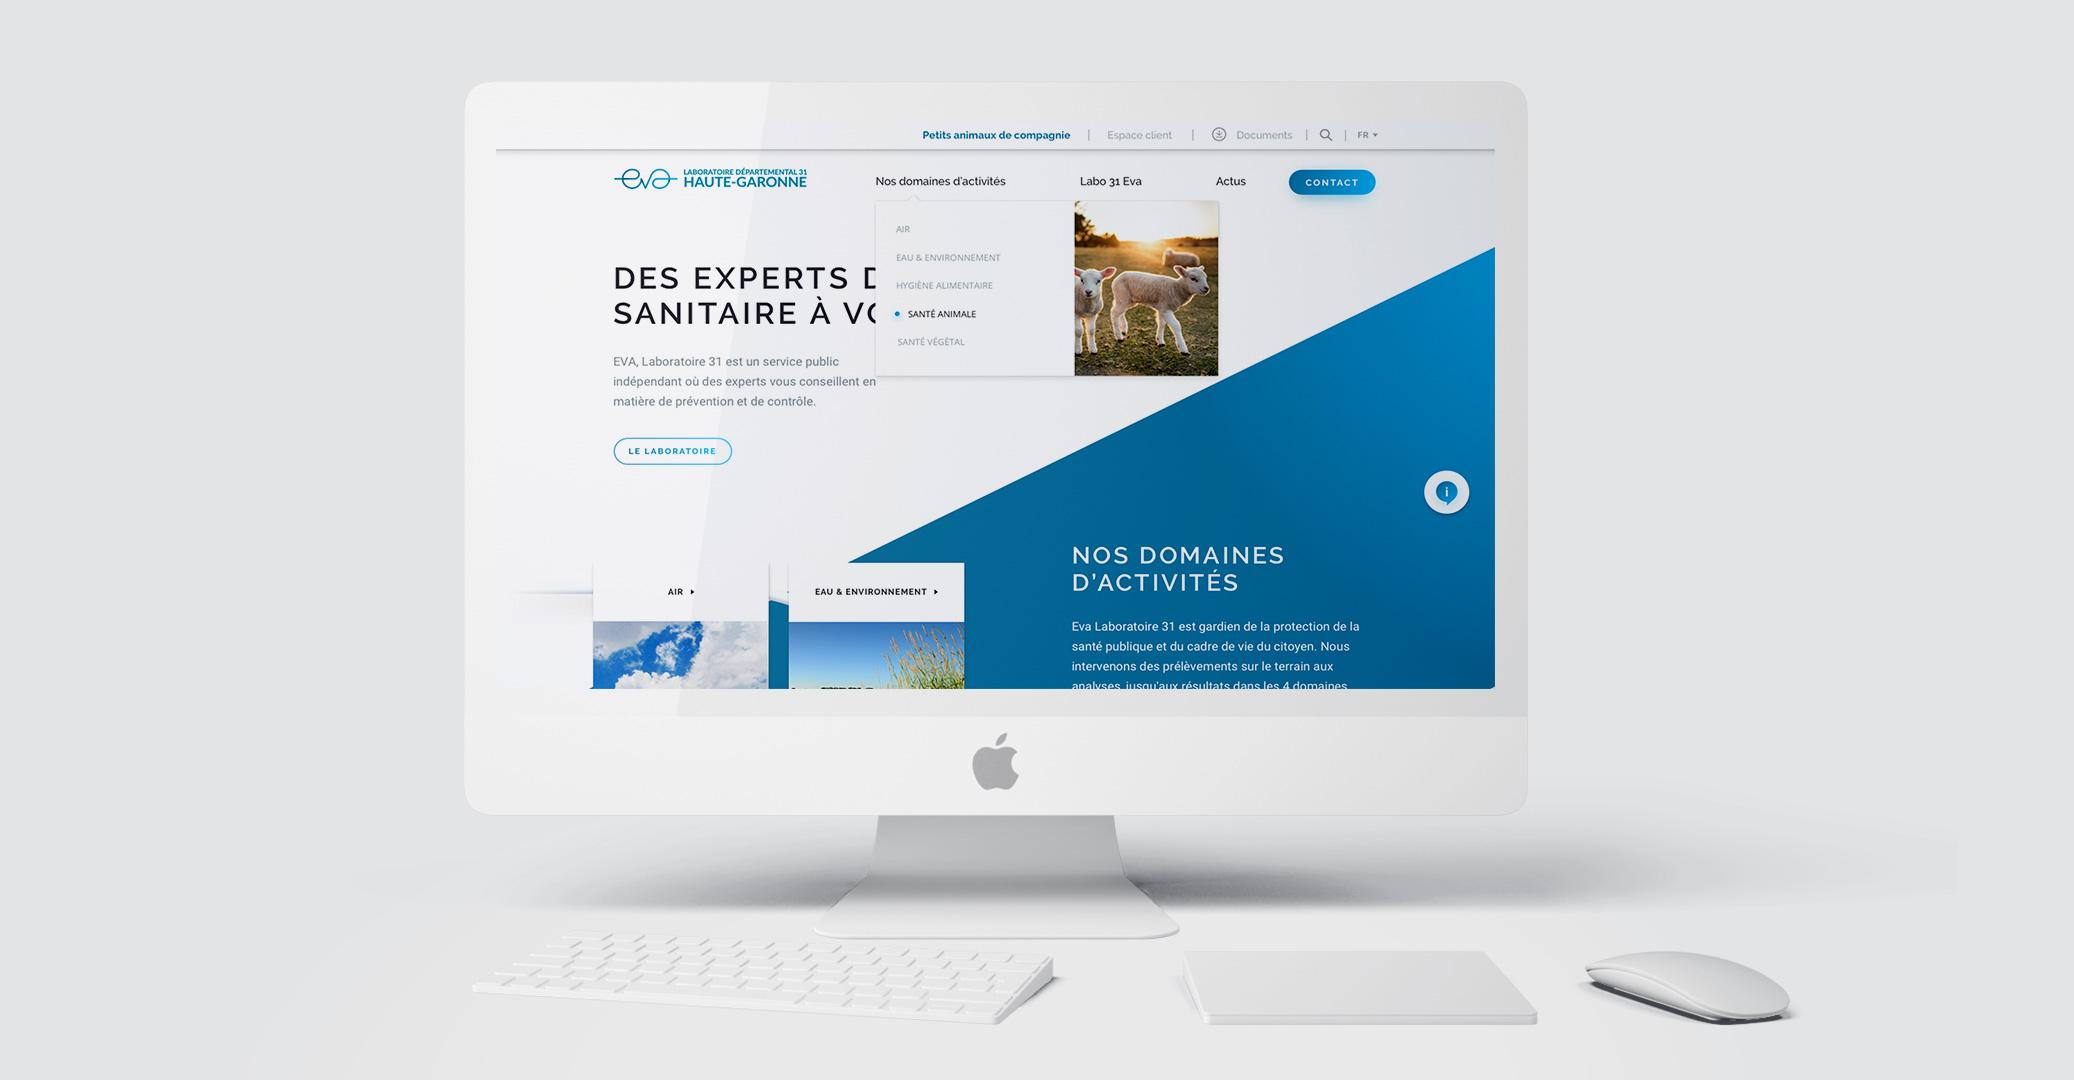 EVA-LABO31 site web